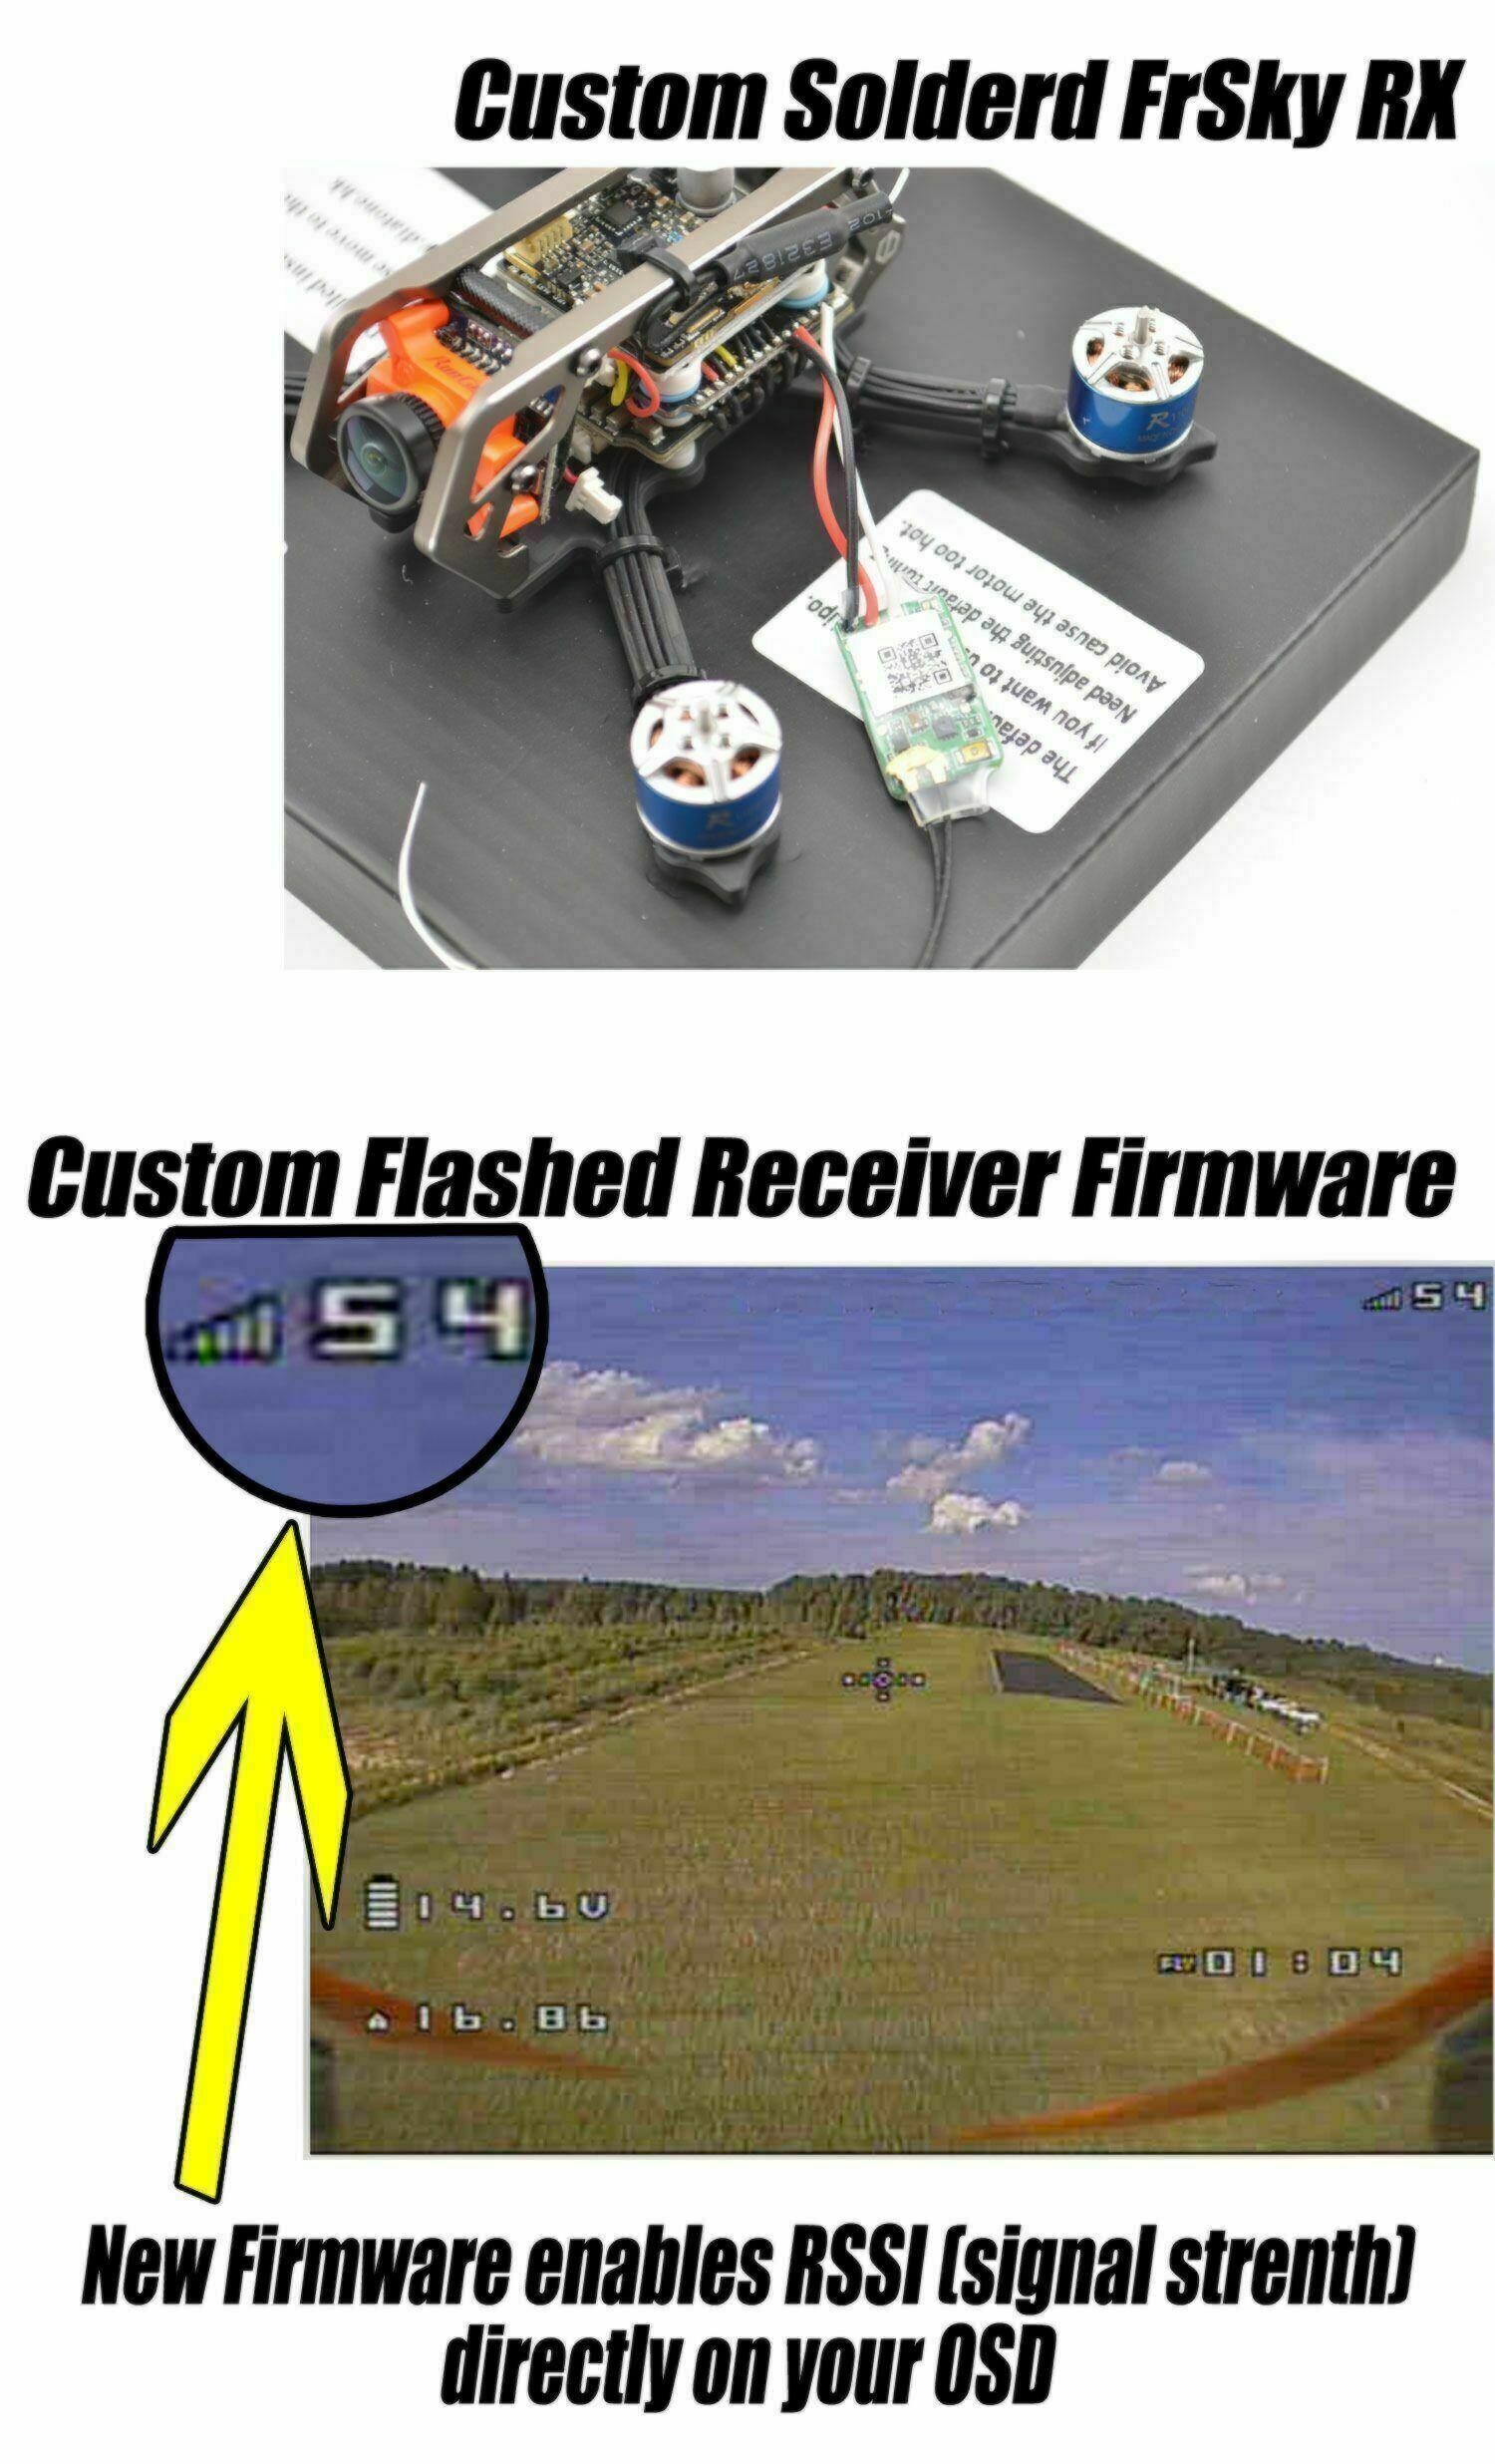 Grayson Custom Solder